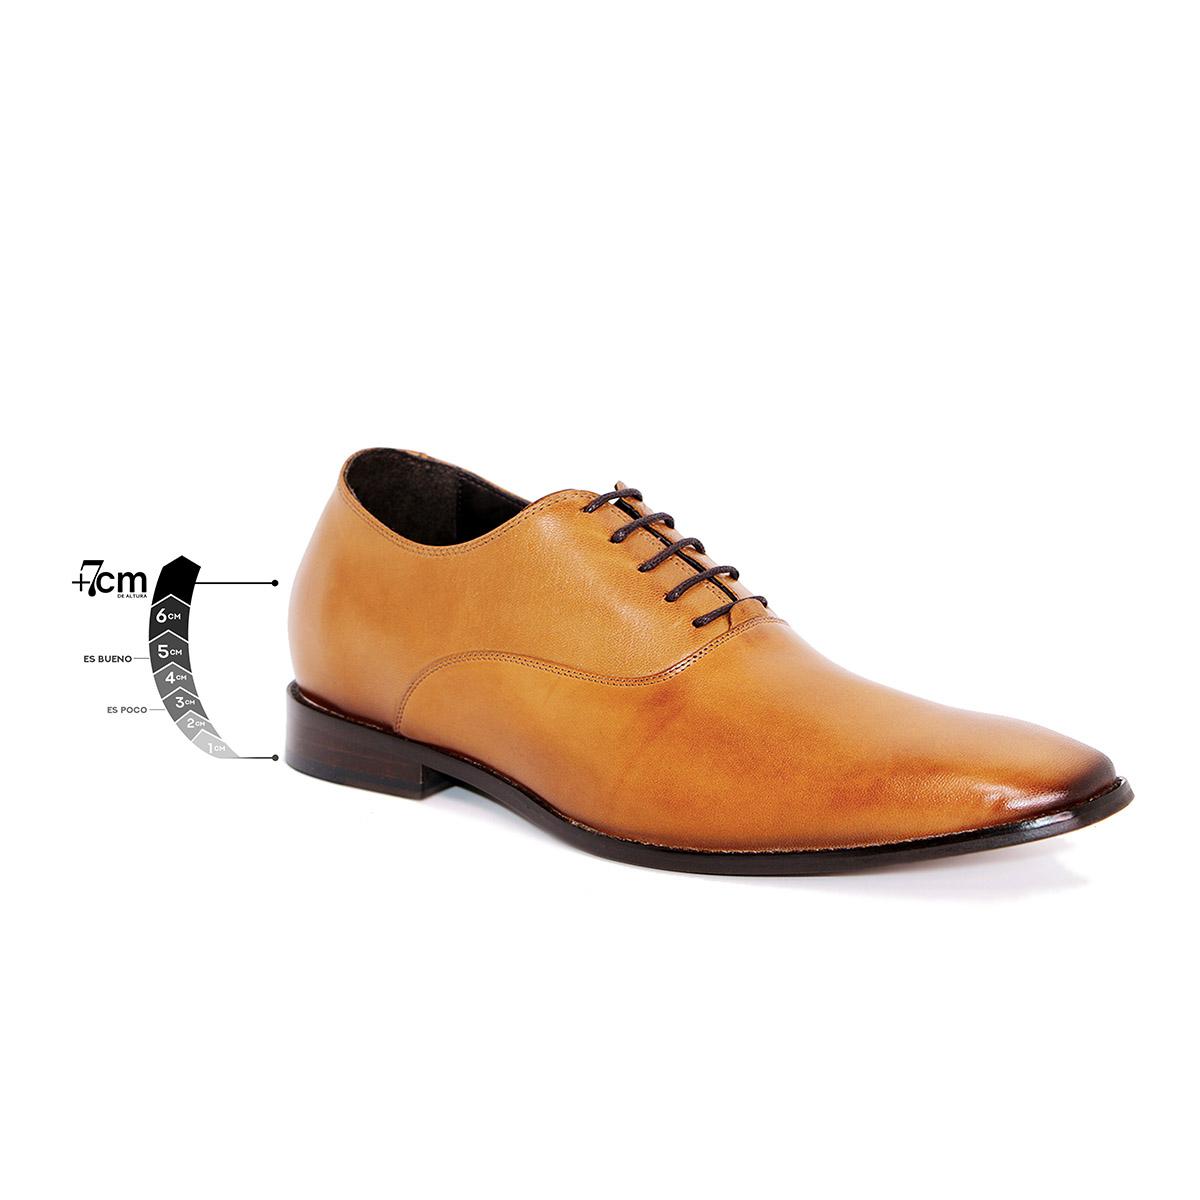 Zapato Formal Elegant Café Claro Max Denegri +7cm de Altura_75305